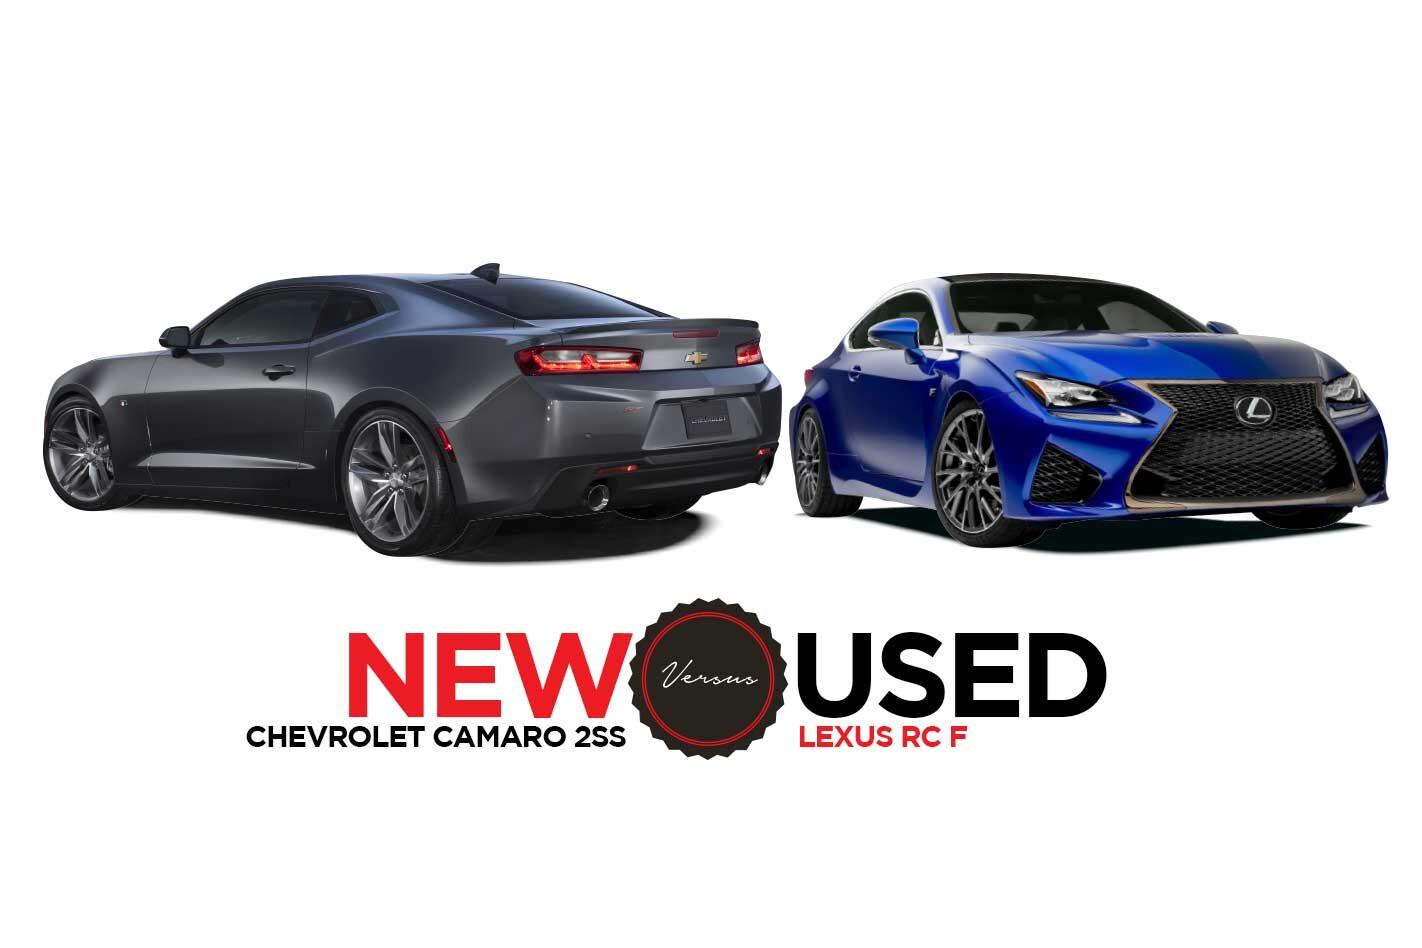 2019 Chevrolet Camaro 2SS vs 2015 Lexus RC F New vs Used